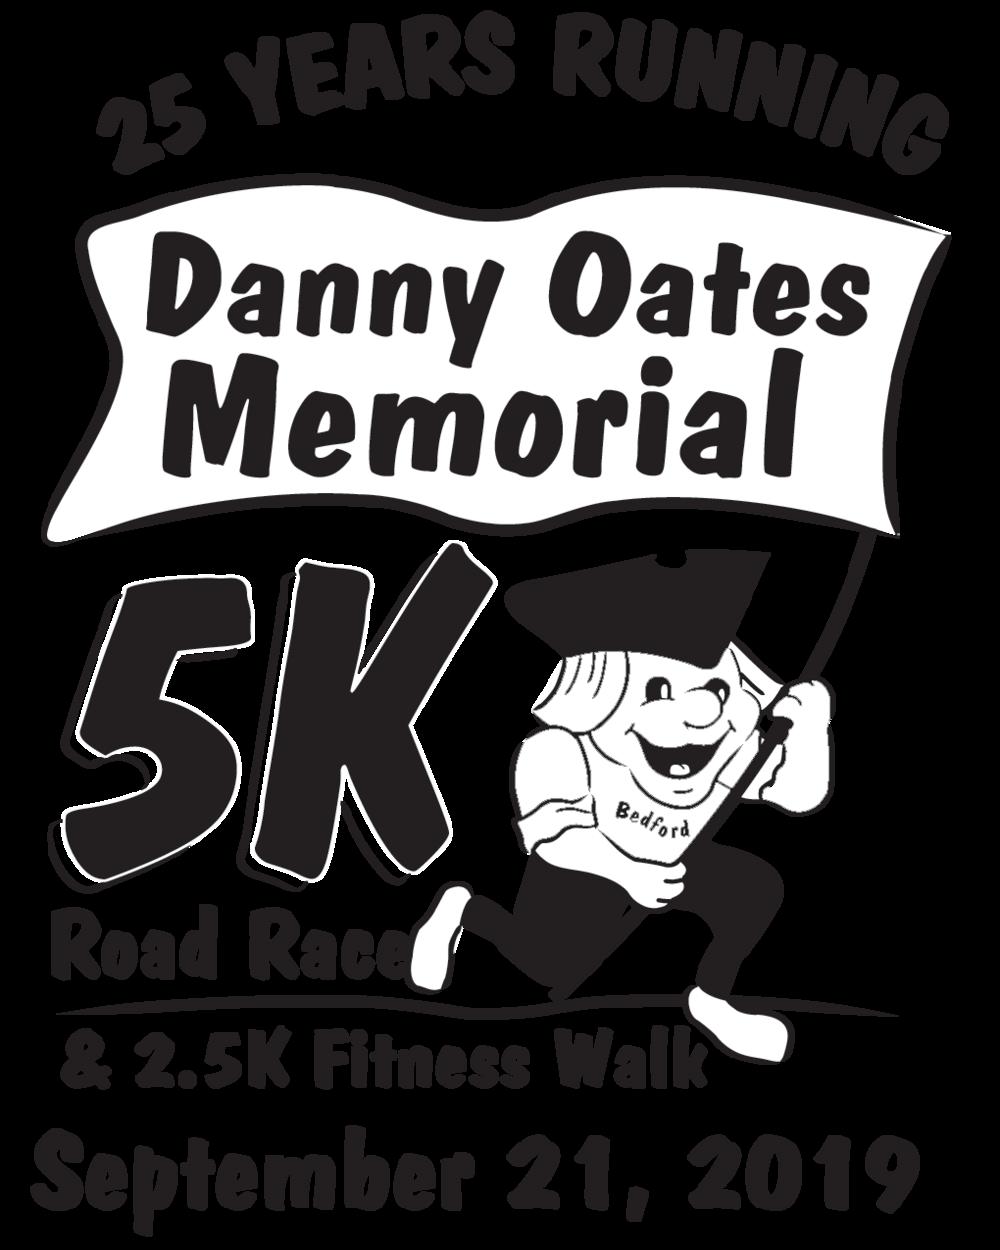 danny oates 2019 logo